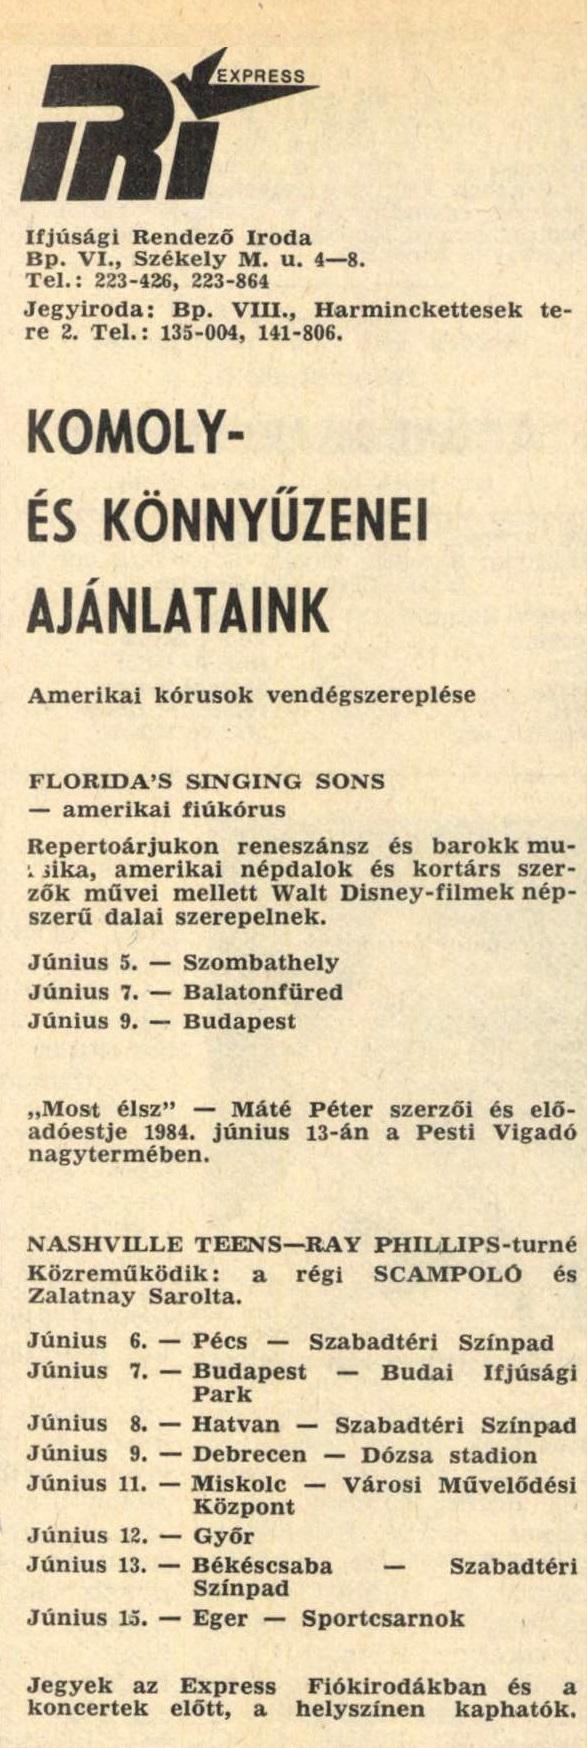 idokapszula_nb_i_1983_84_29_fordulo_reklam_1.jpg